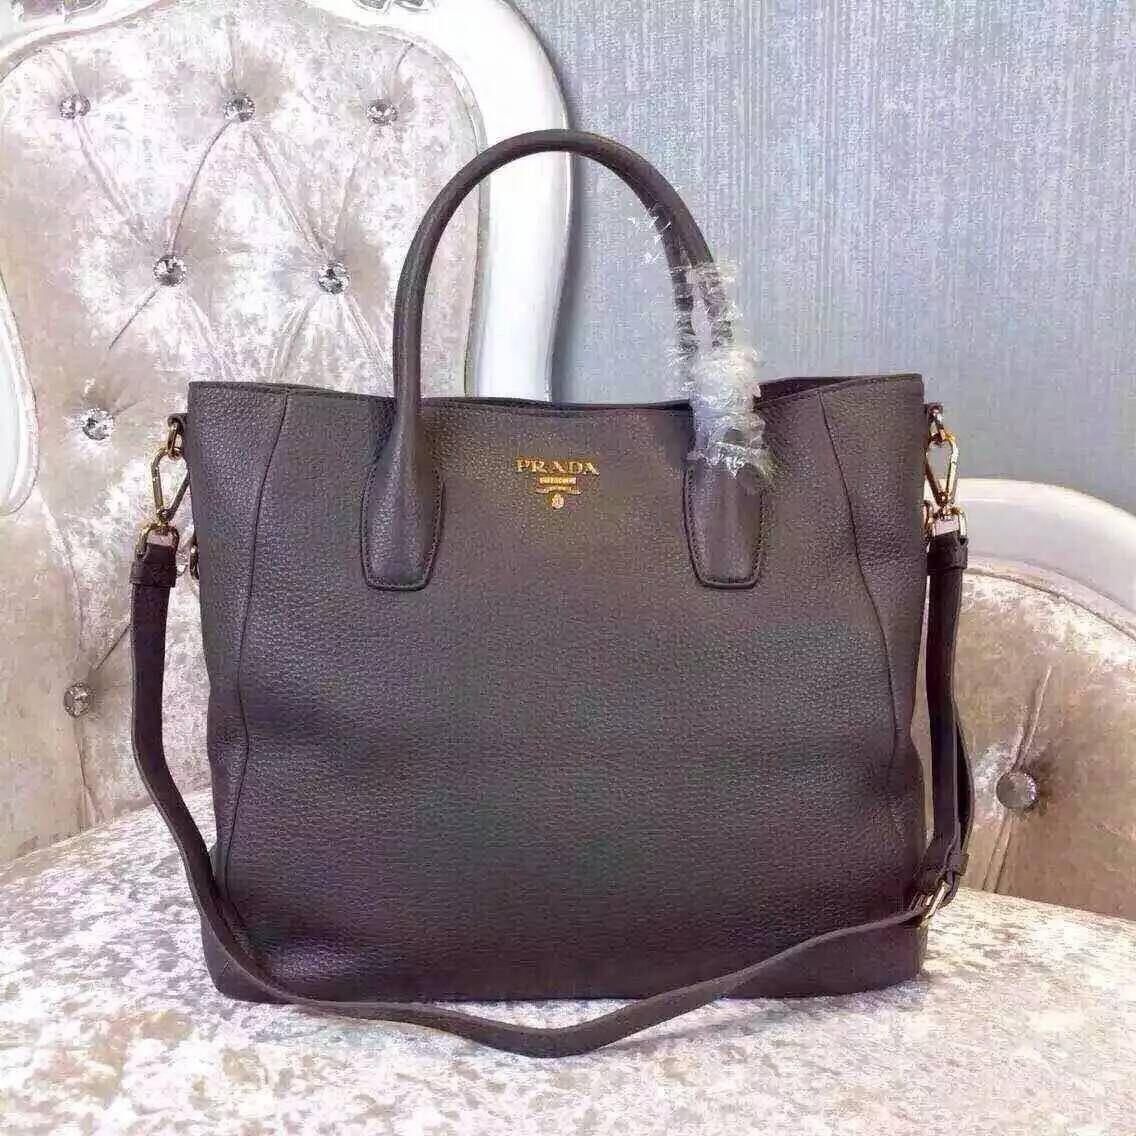 Prada handbags whatsapp:+8615992402410 skype:xiaohui.zhong1986 ... afb8b2c67c